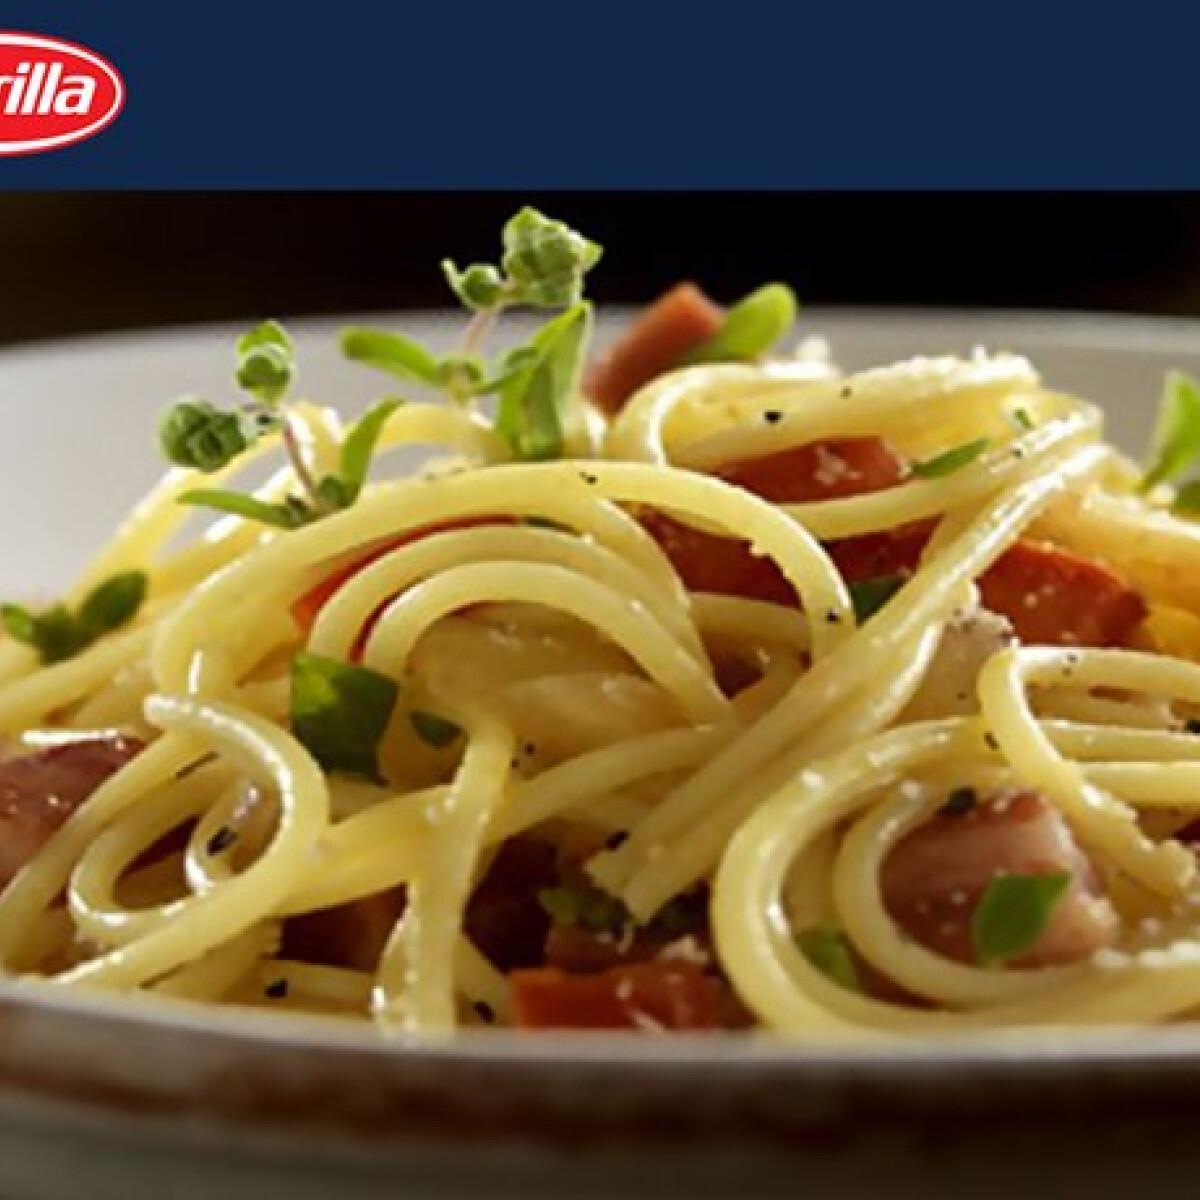 Ezen a képen: Spagetti pancettaval és pecorino sajttal